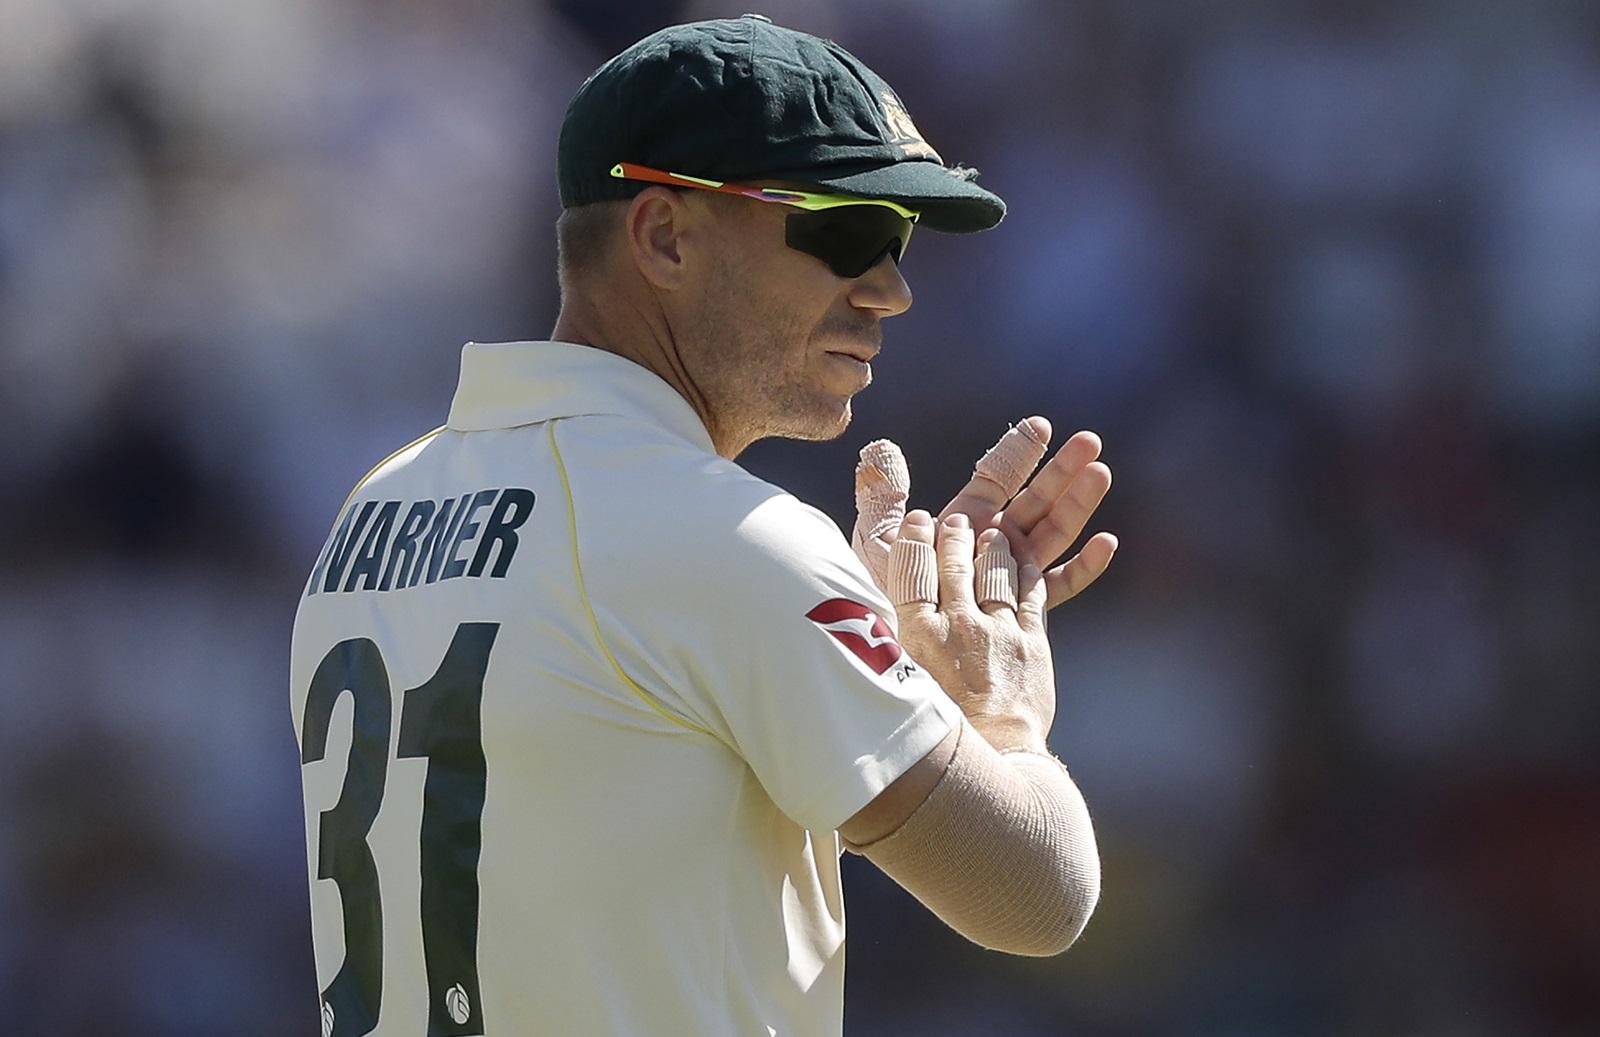 Warner won't be barracking for England Test team - cricket.com.au